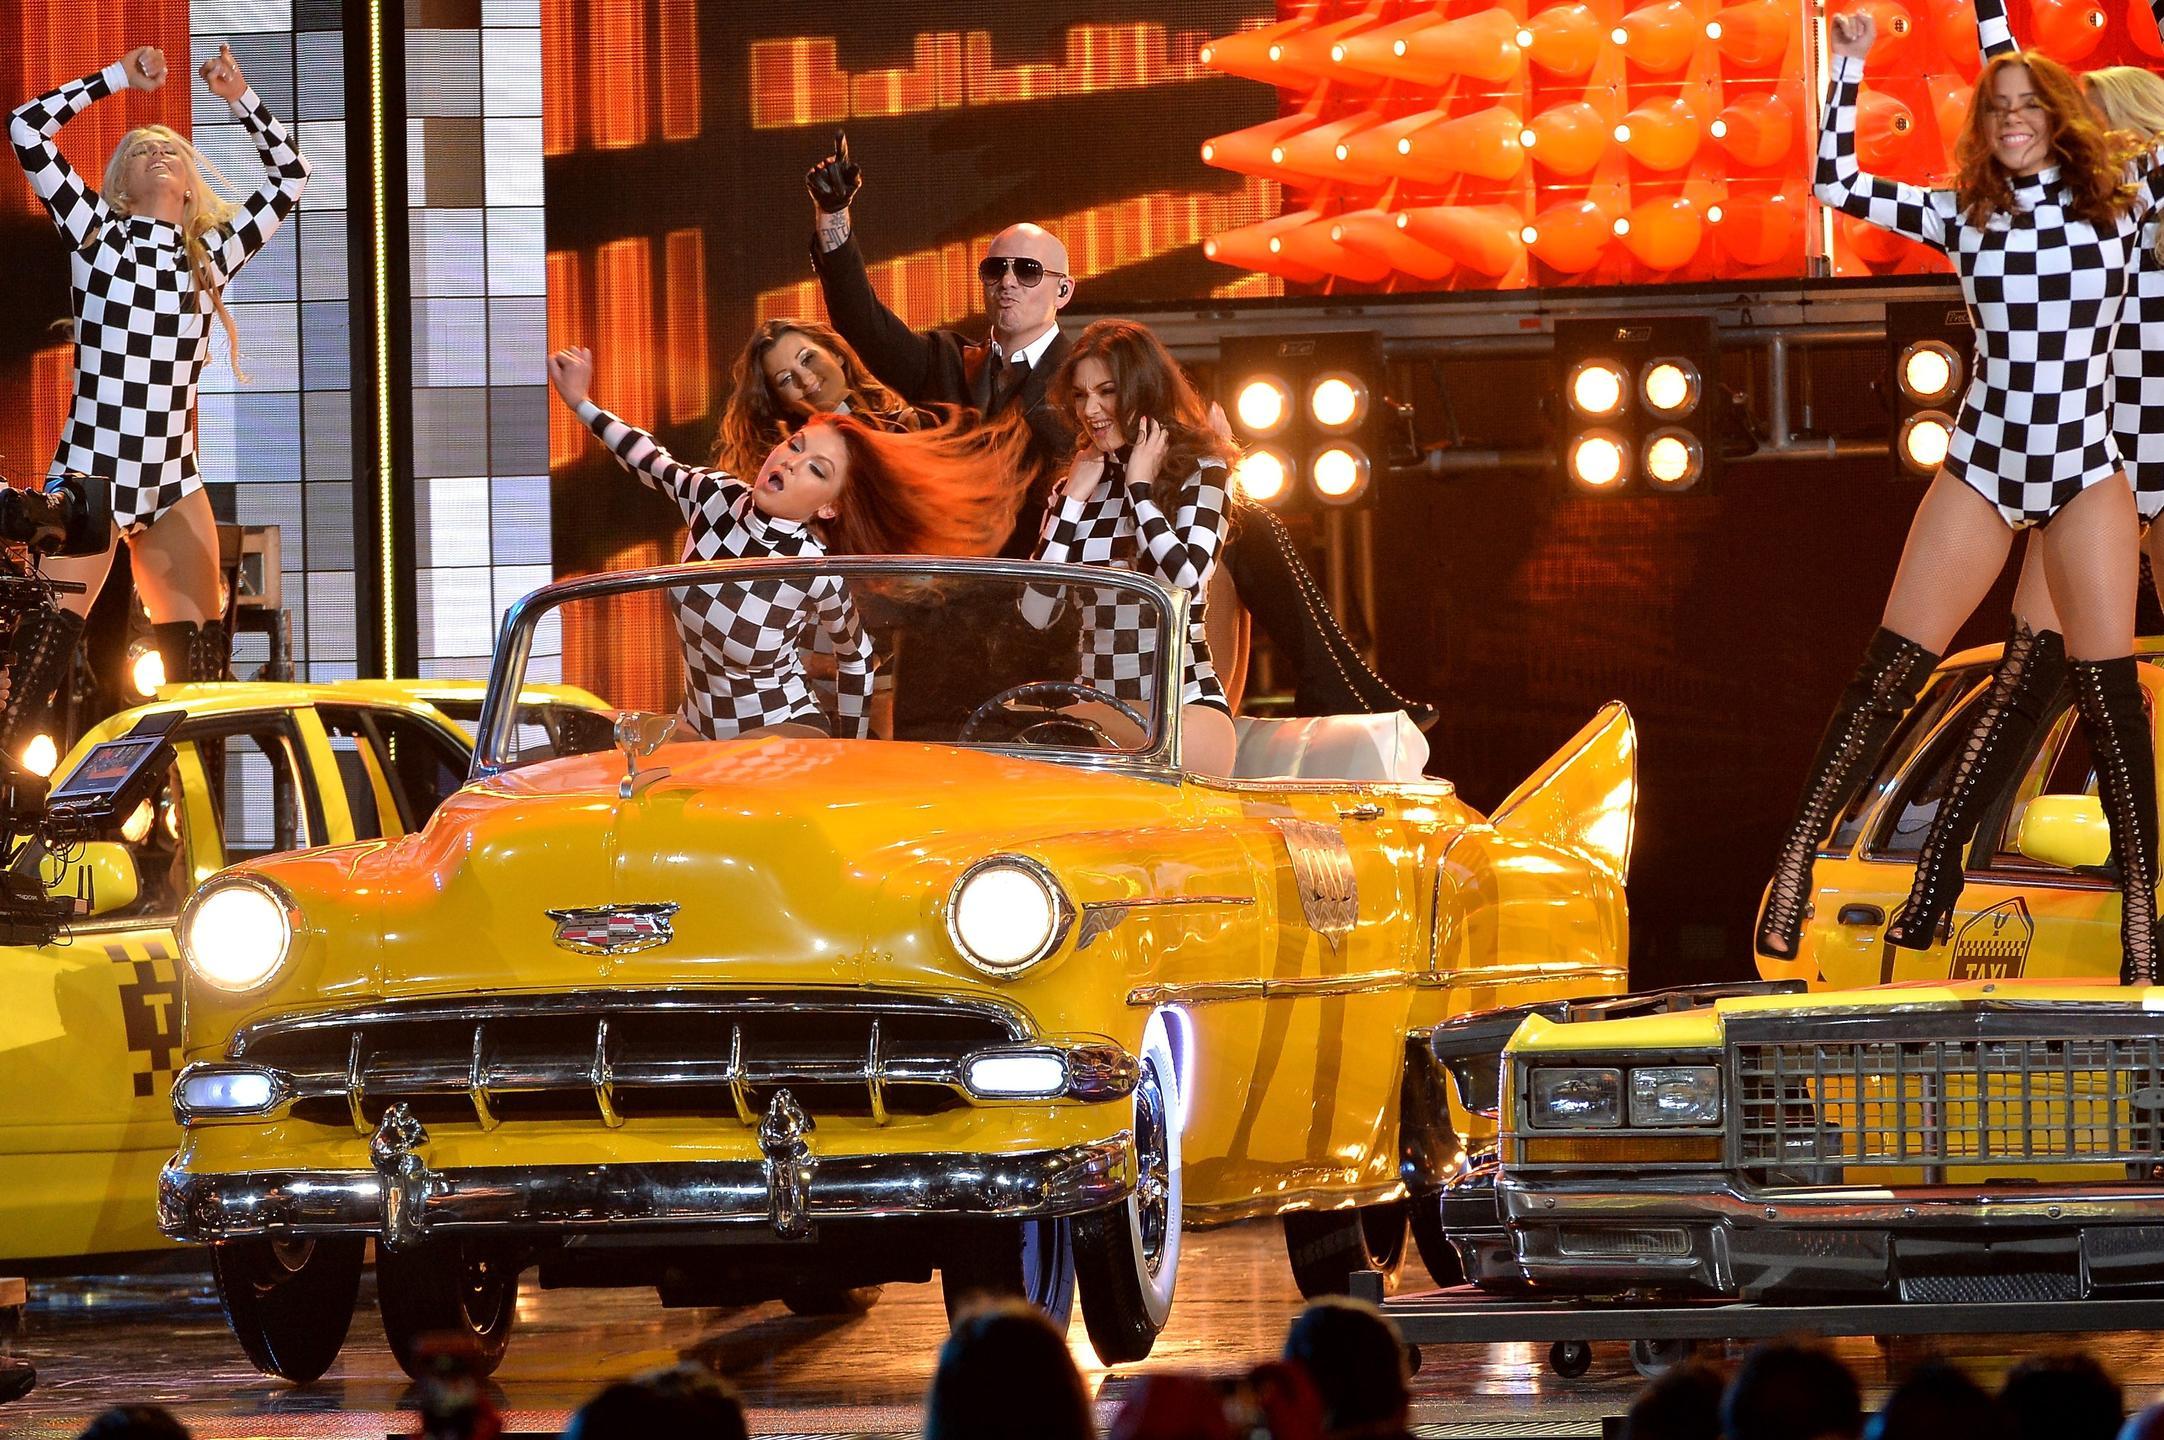 Pitbull - Premios Lo Nuestro 2016